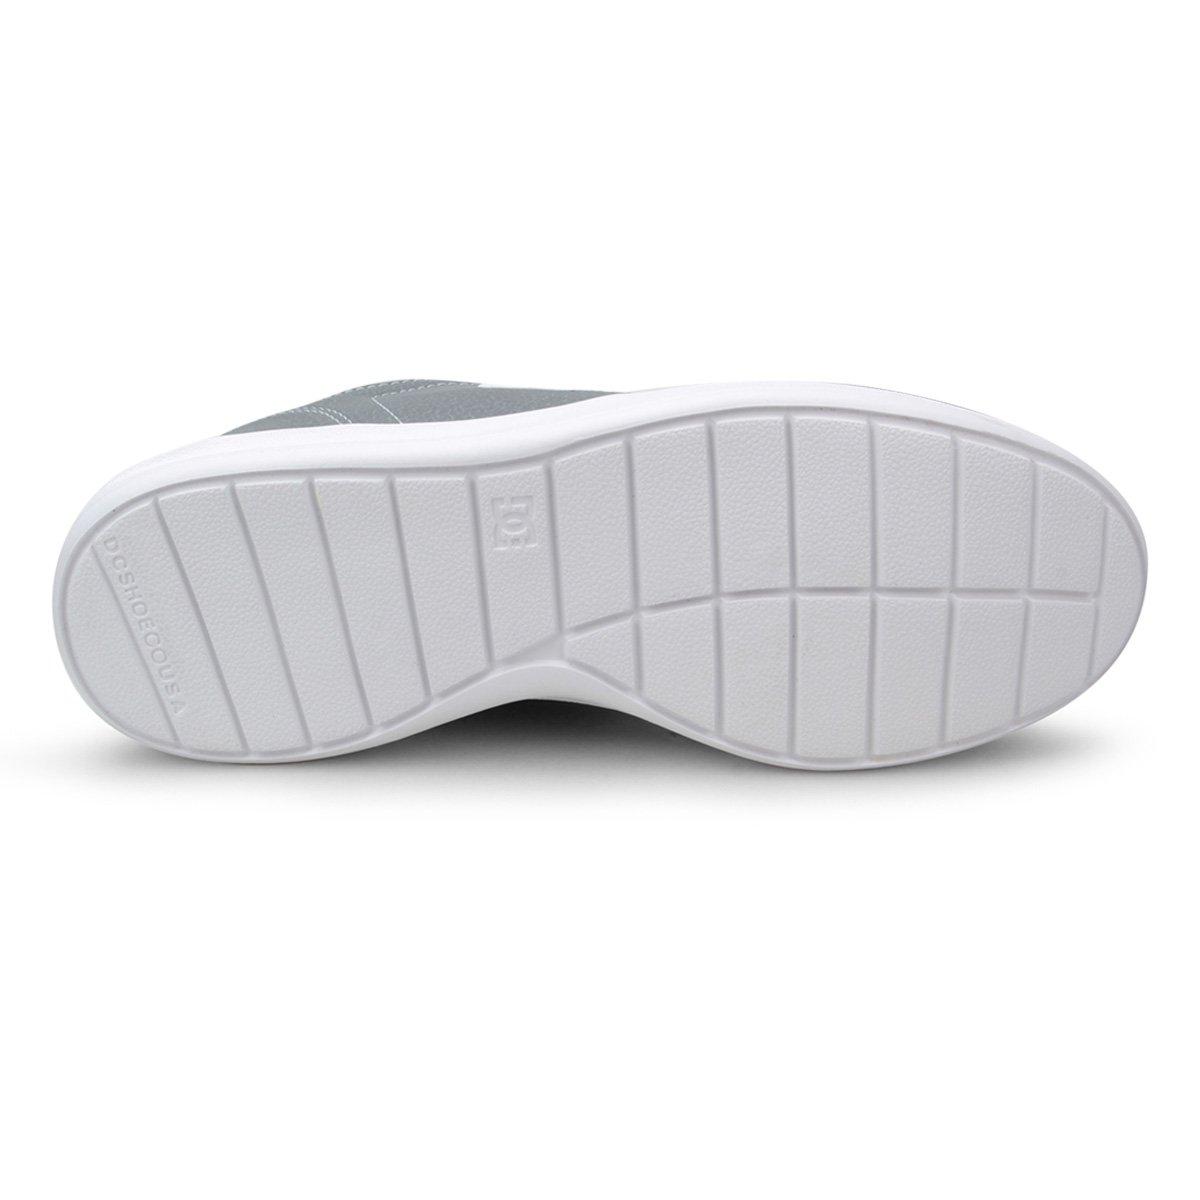 5502a1f670 Tênis DC Shoes Mid Adys Masculino - Tam: 40 - Shopping TudoAzul